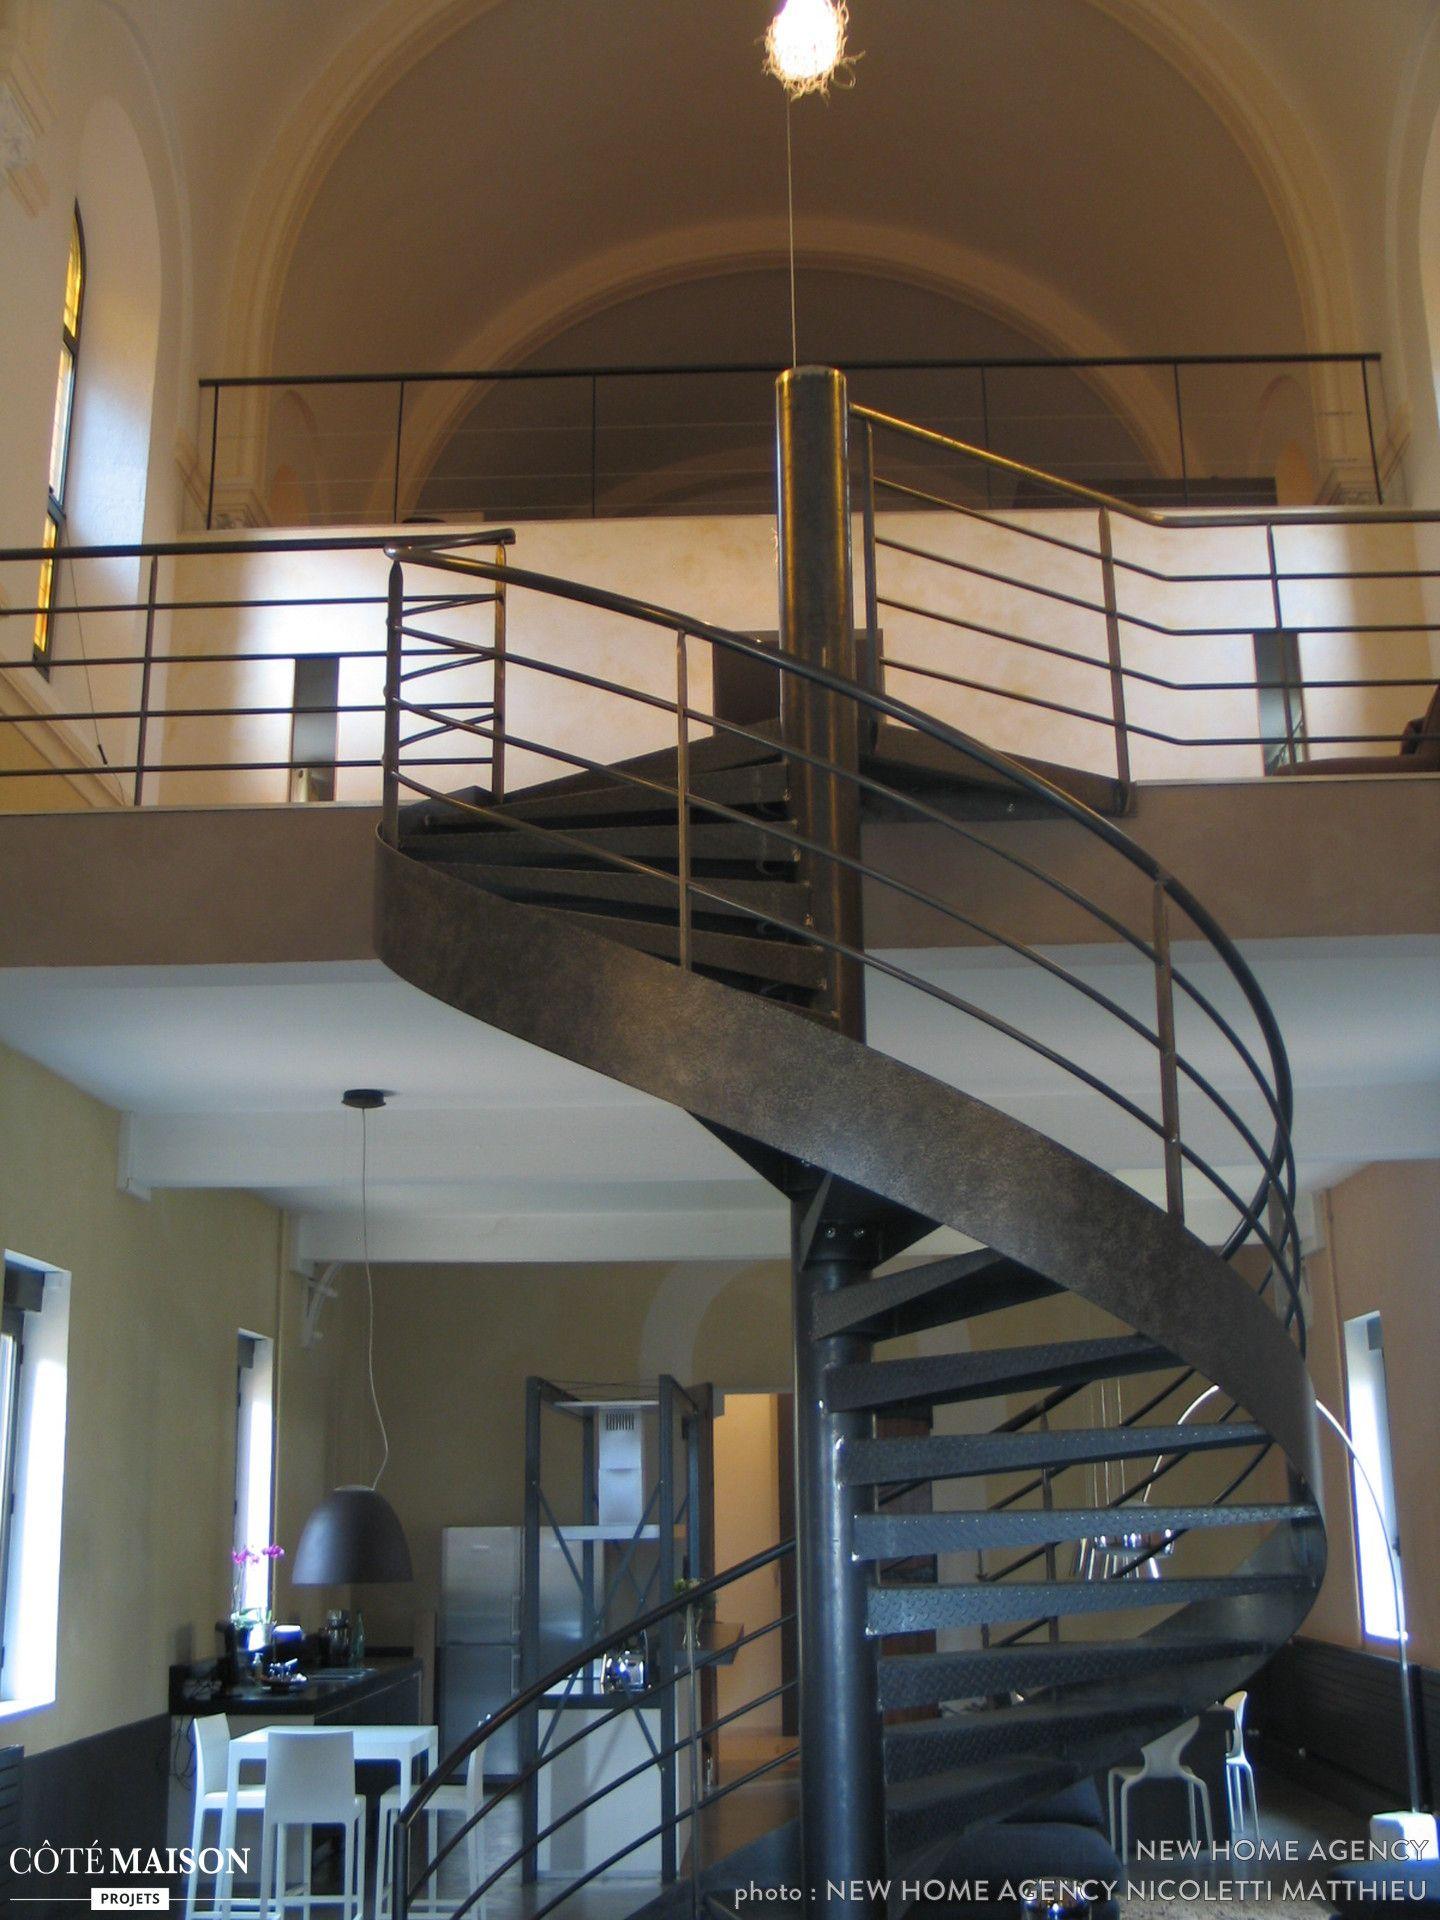 escalier en colima on noir escaliers escaliers interieur escalier en colima on et colima on. Black Bedroom Furniture Sets. Home Design Ideas